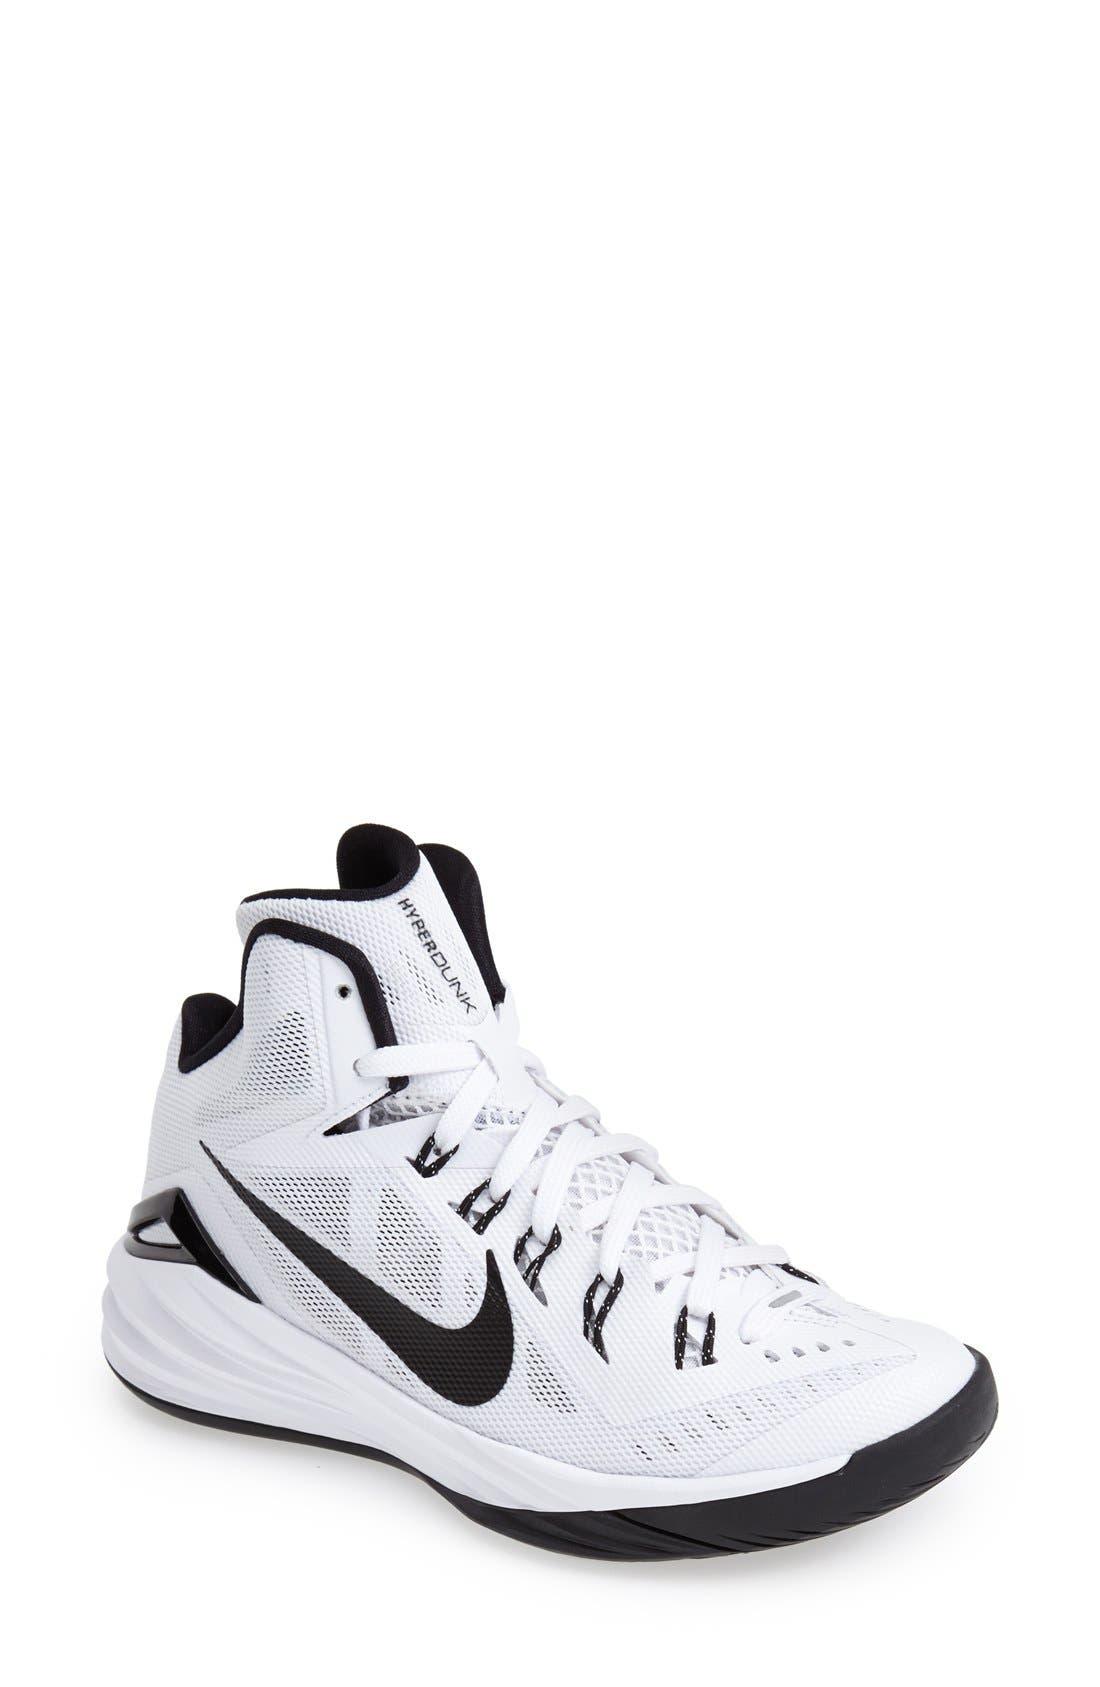 Alternate Image 1 Selected - Nike 'Hyperdunk 2014' Basketball Shoe (Women)